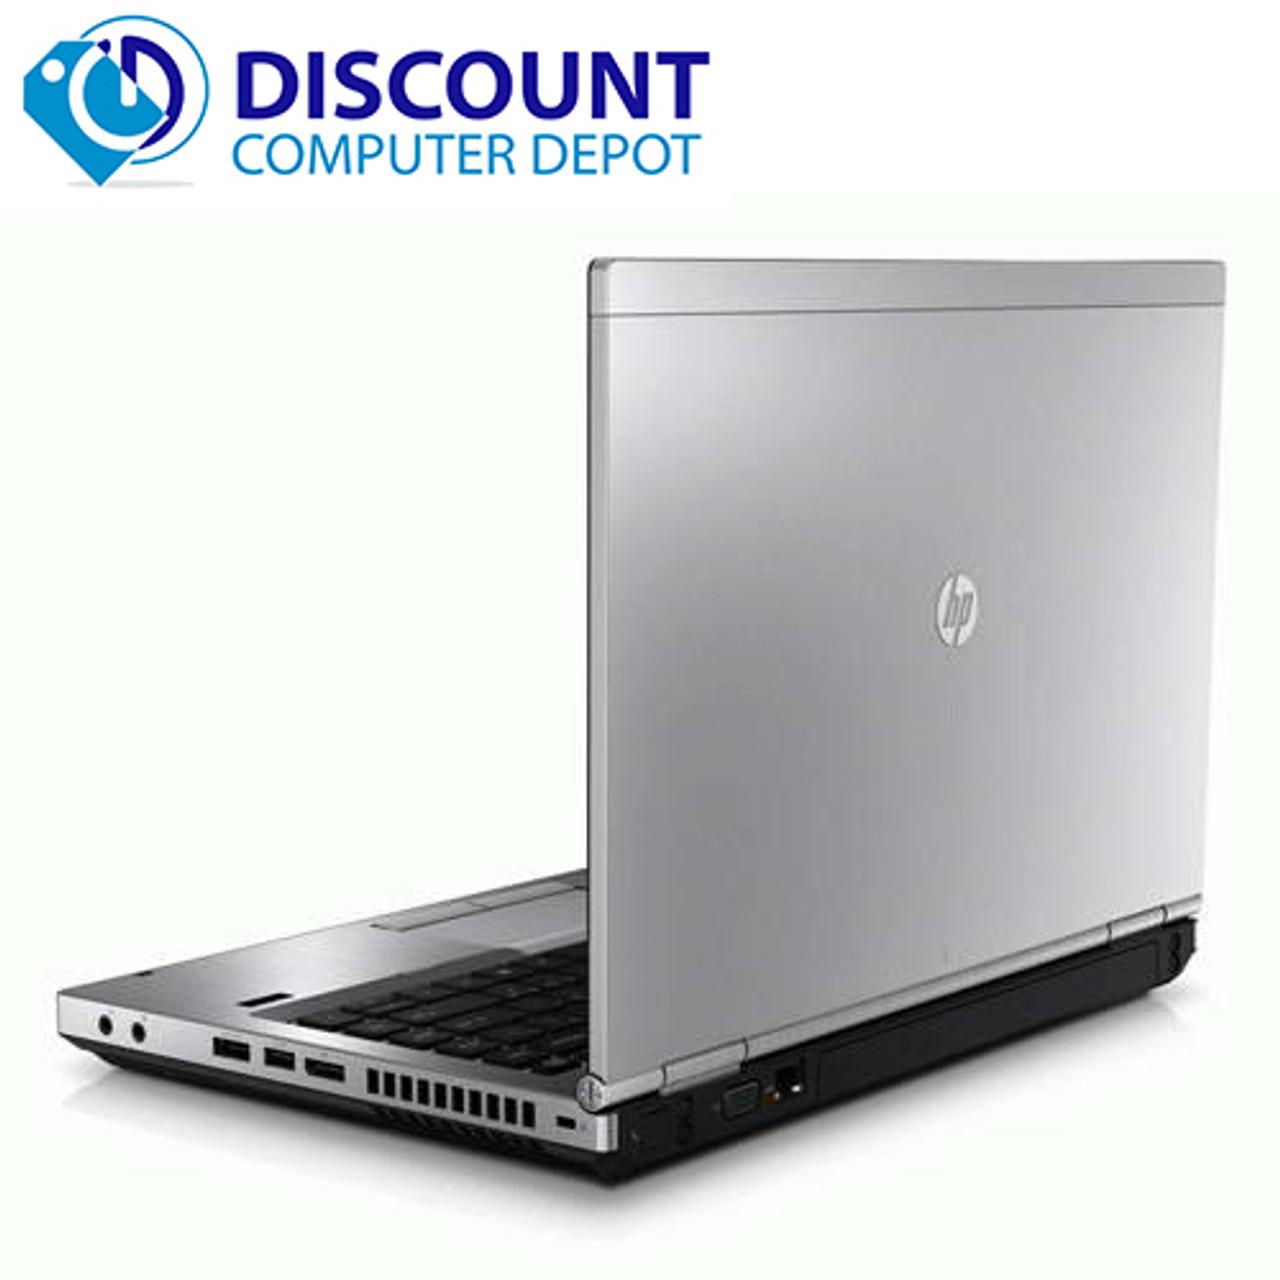 Customize Your own HP Elitebook 8460p i5 2 5GHz Windows 10 14